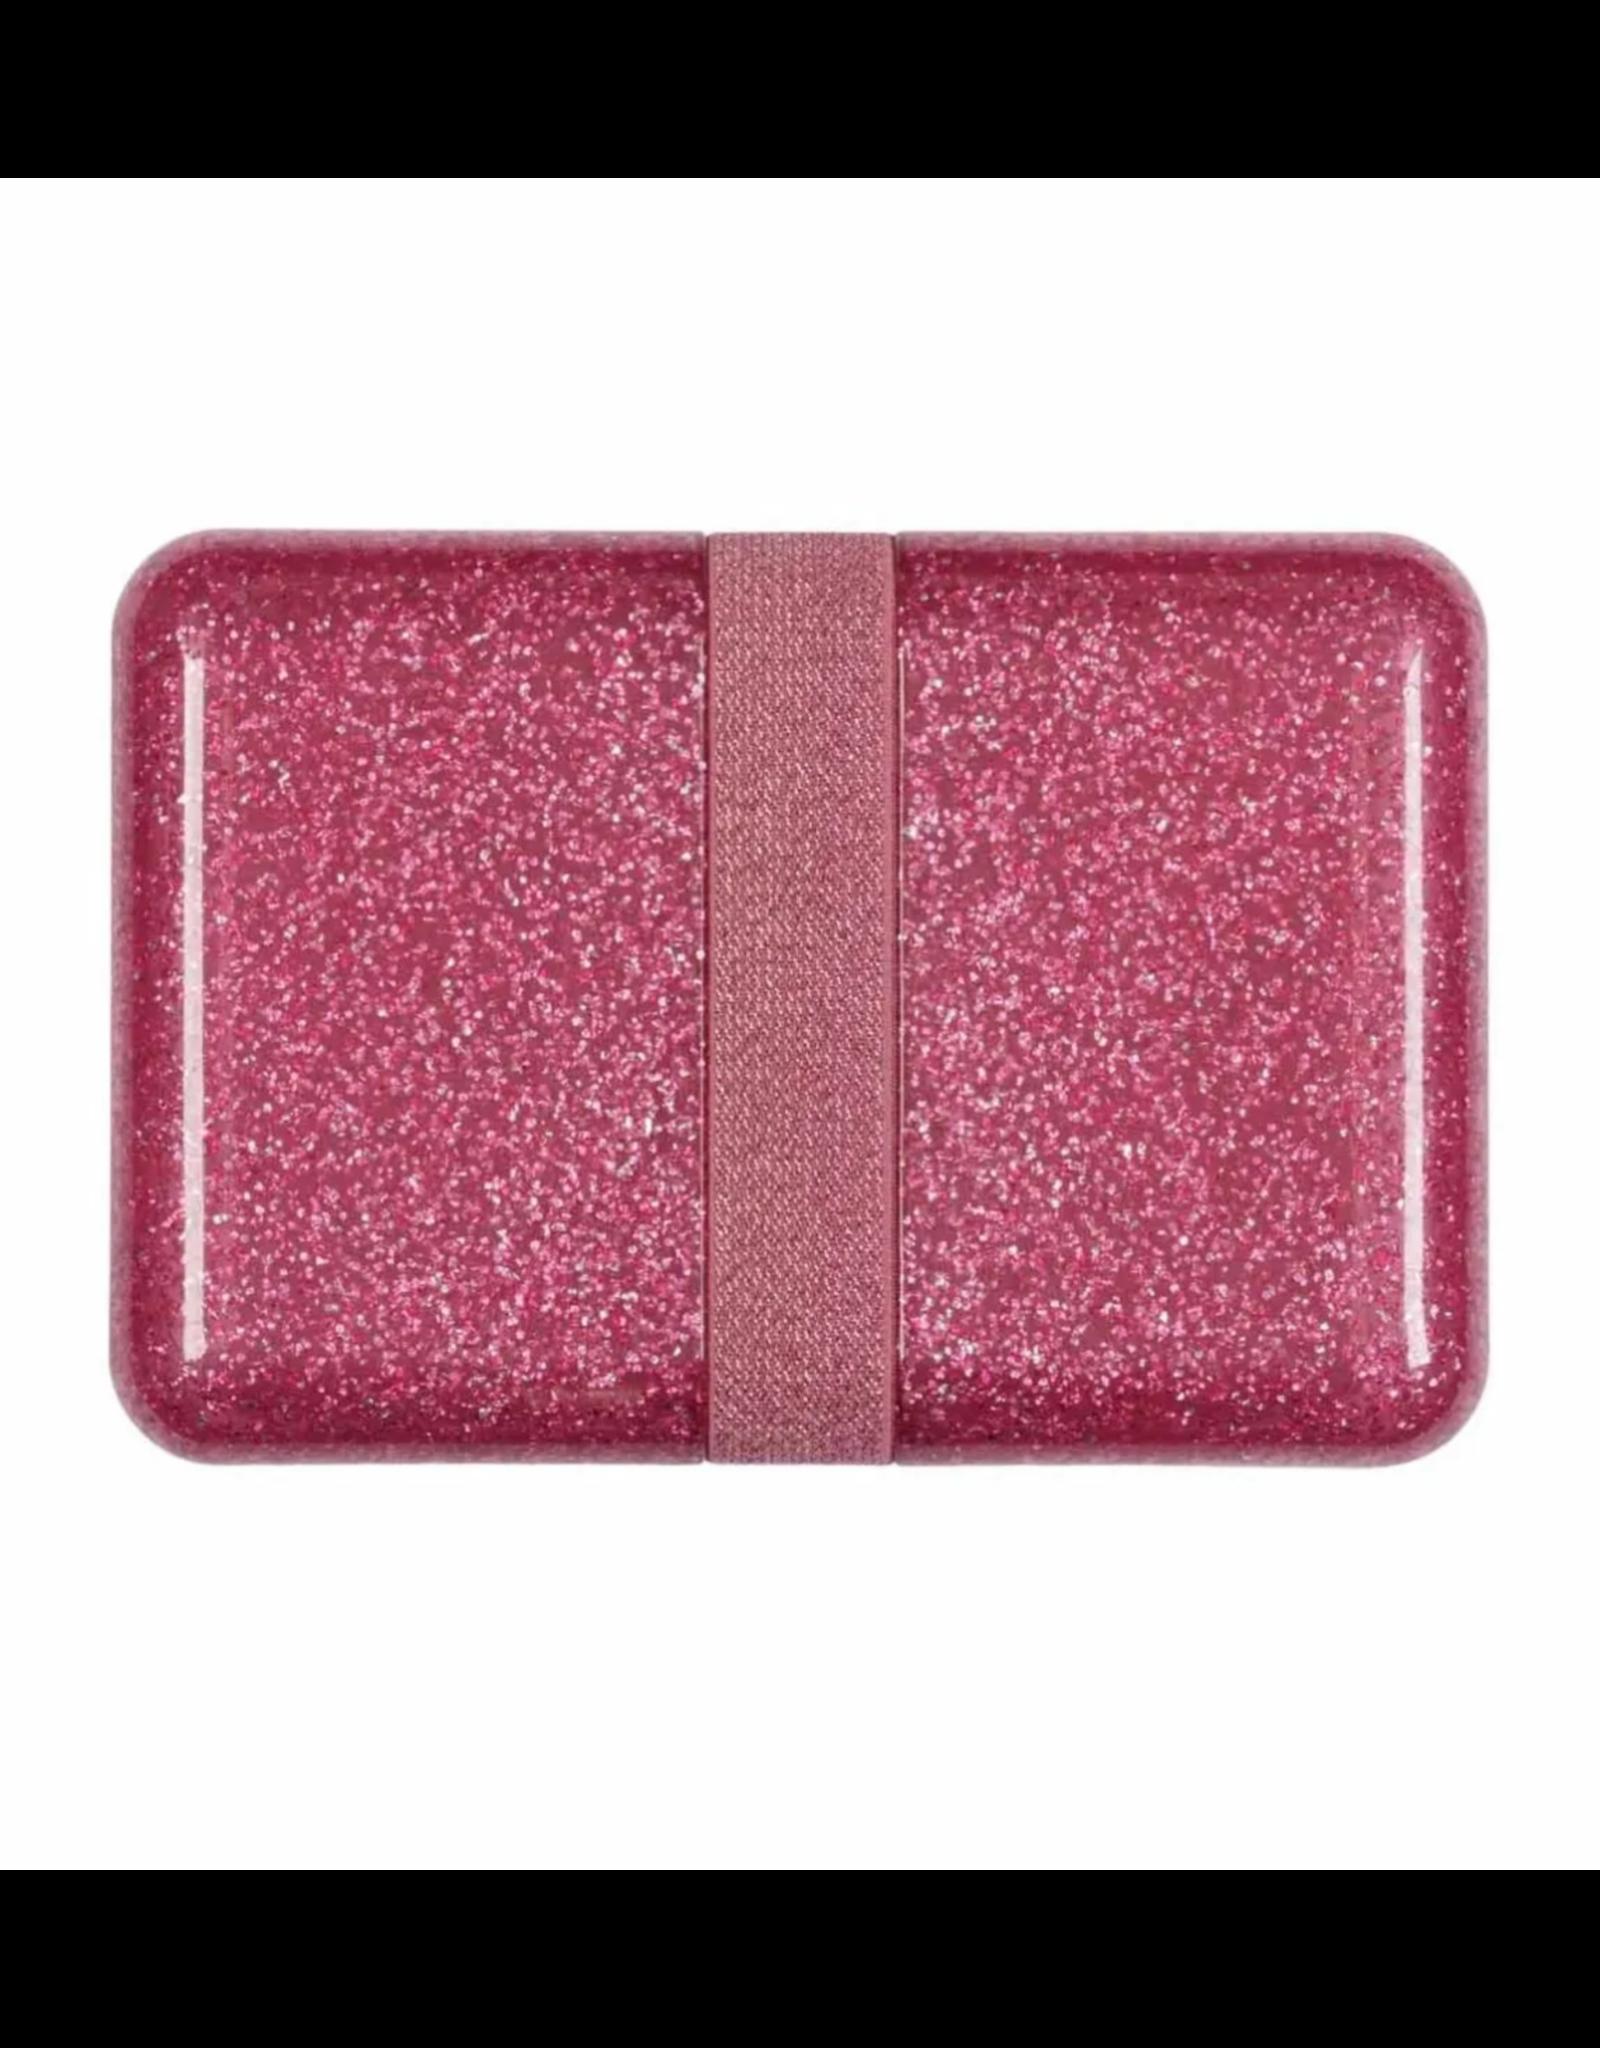 Brooddoos met rekker glitter roze